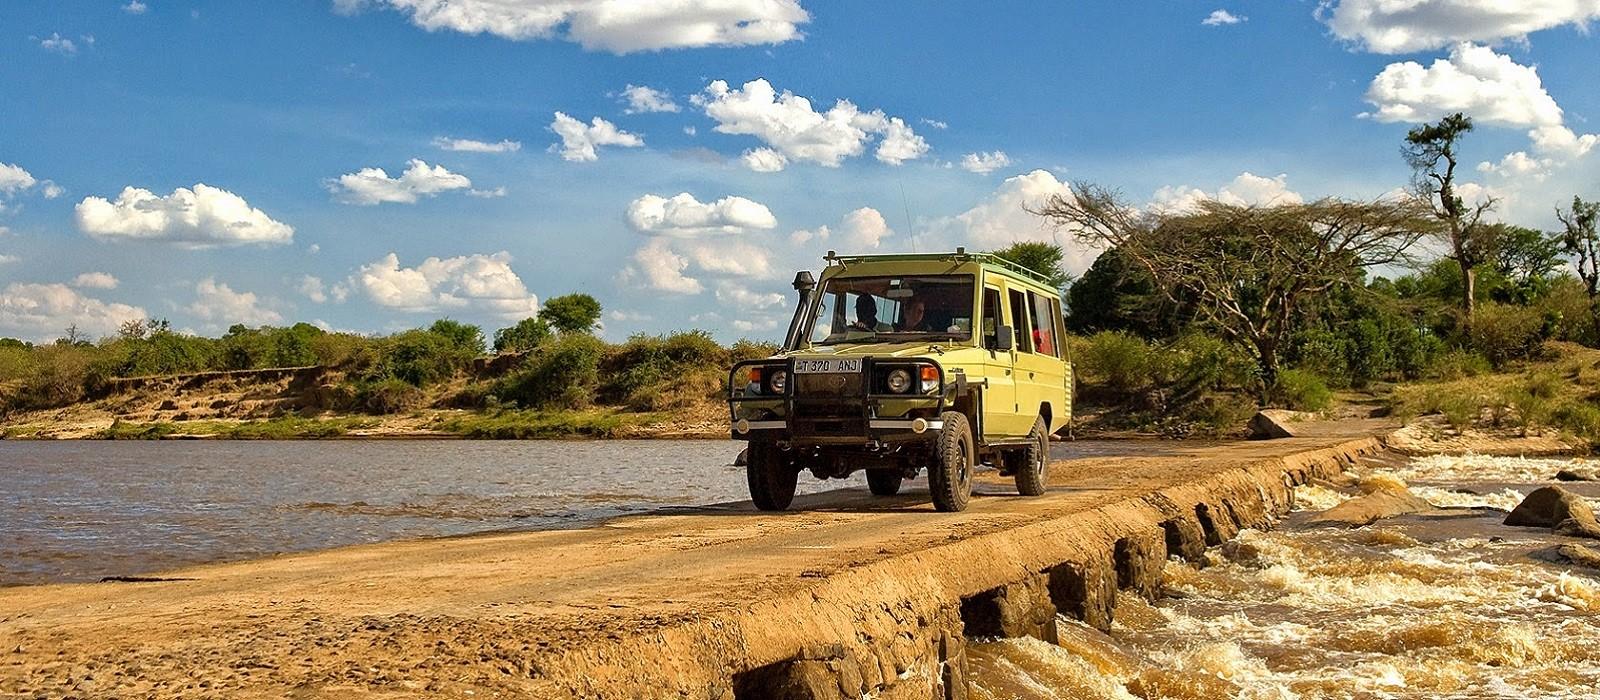 Safari Höhepunkte: Tansania, Simbabwe und Botswana Urlaub 1